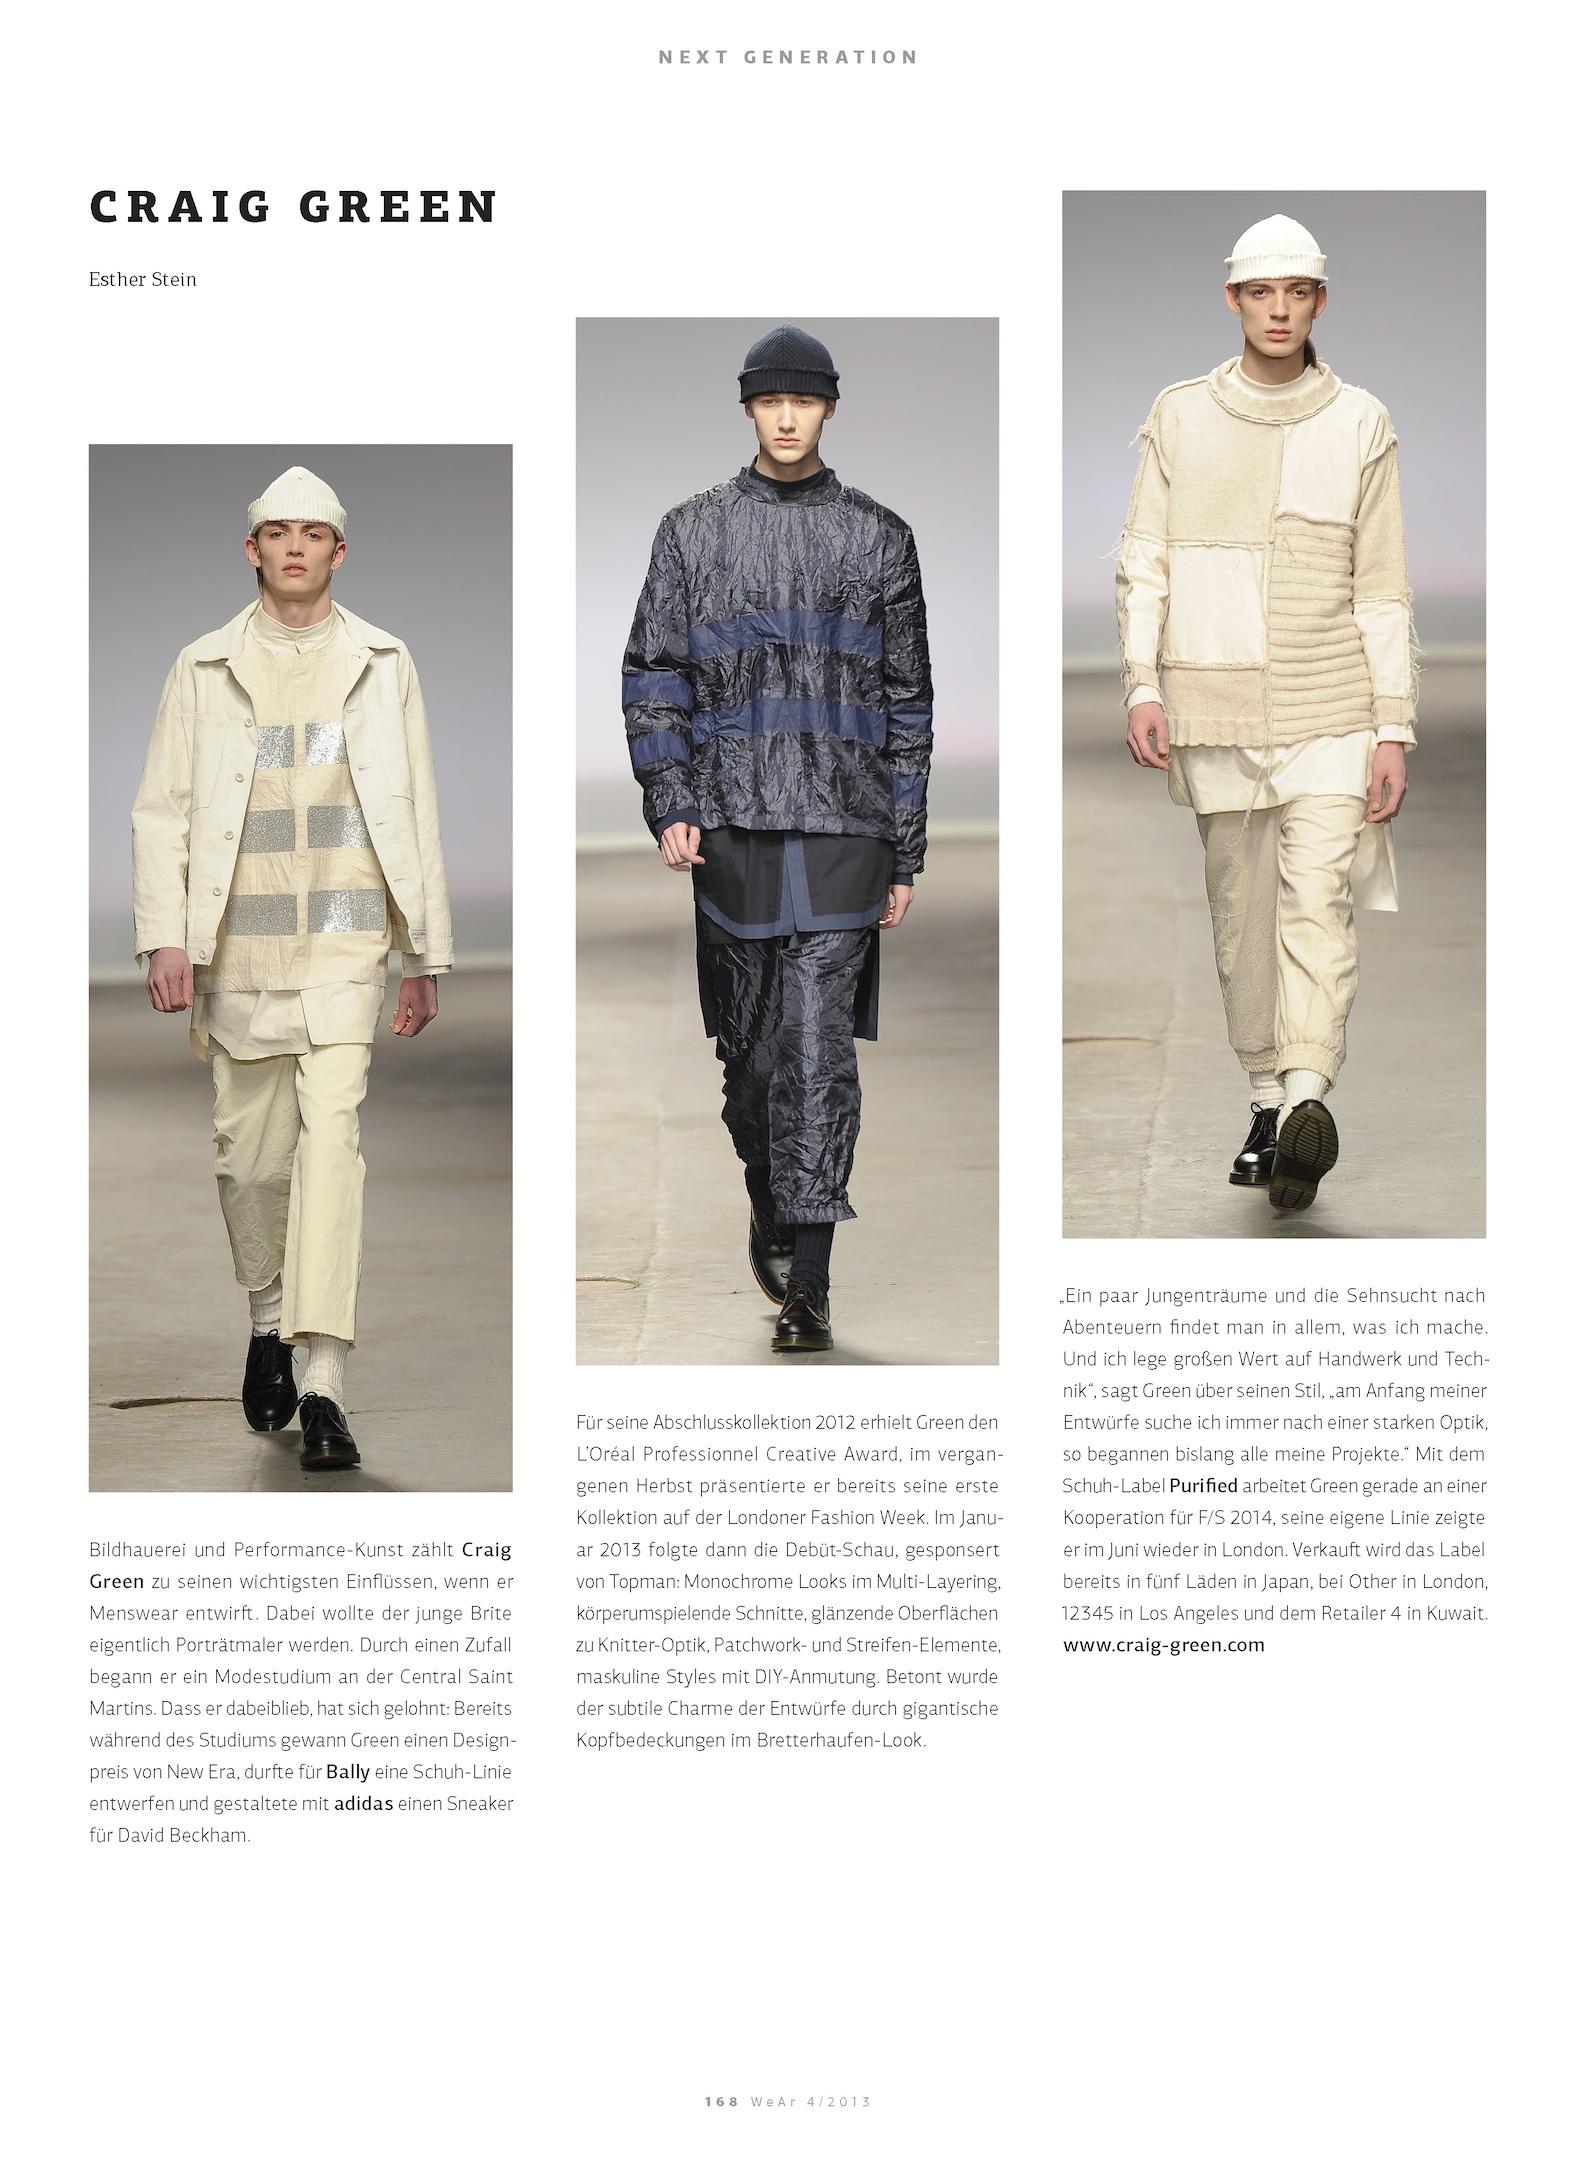 Men's Fashion: Craig Green, WeAr_04_2013